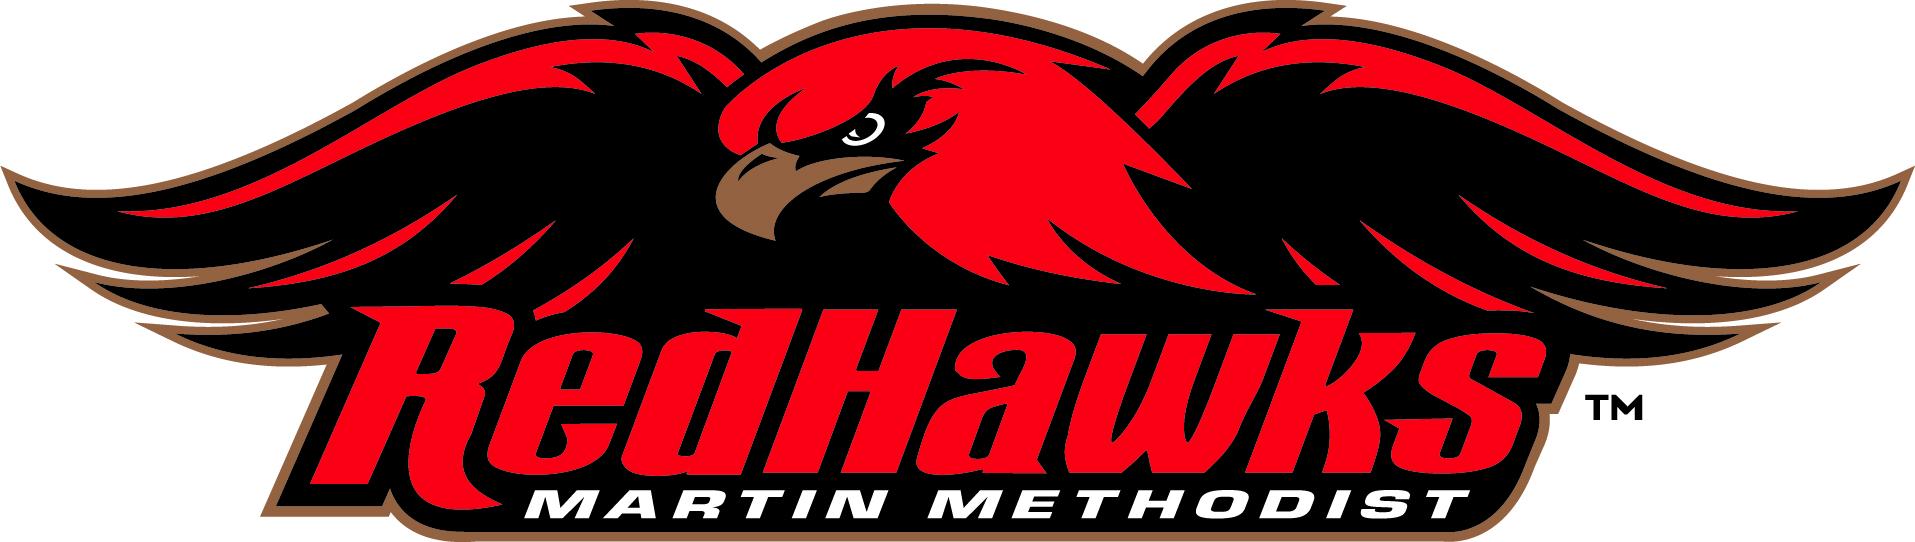 Martin Methodist Will Add Men's & Women's NAIA Swimming in 2020